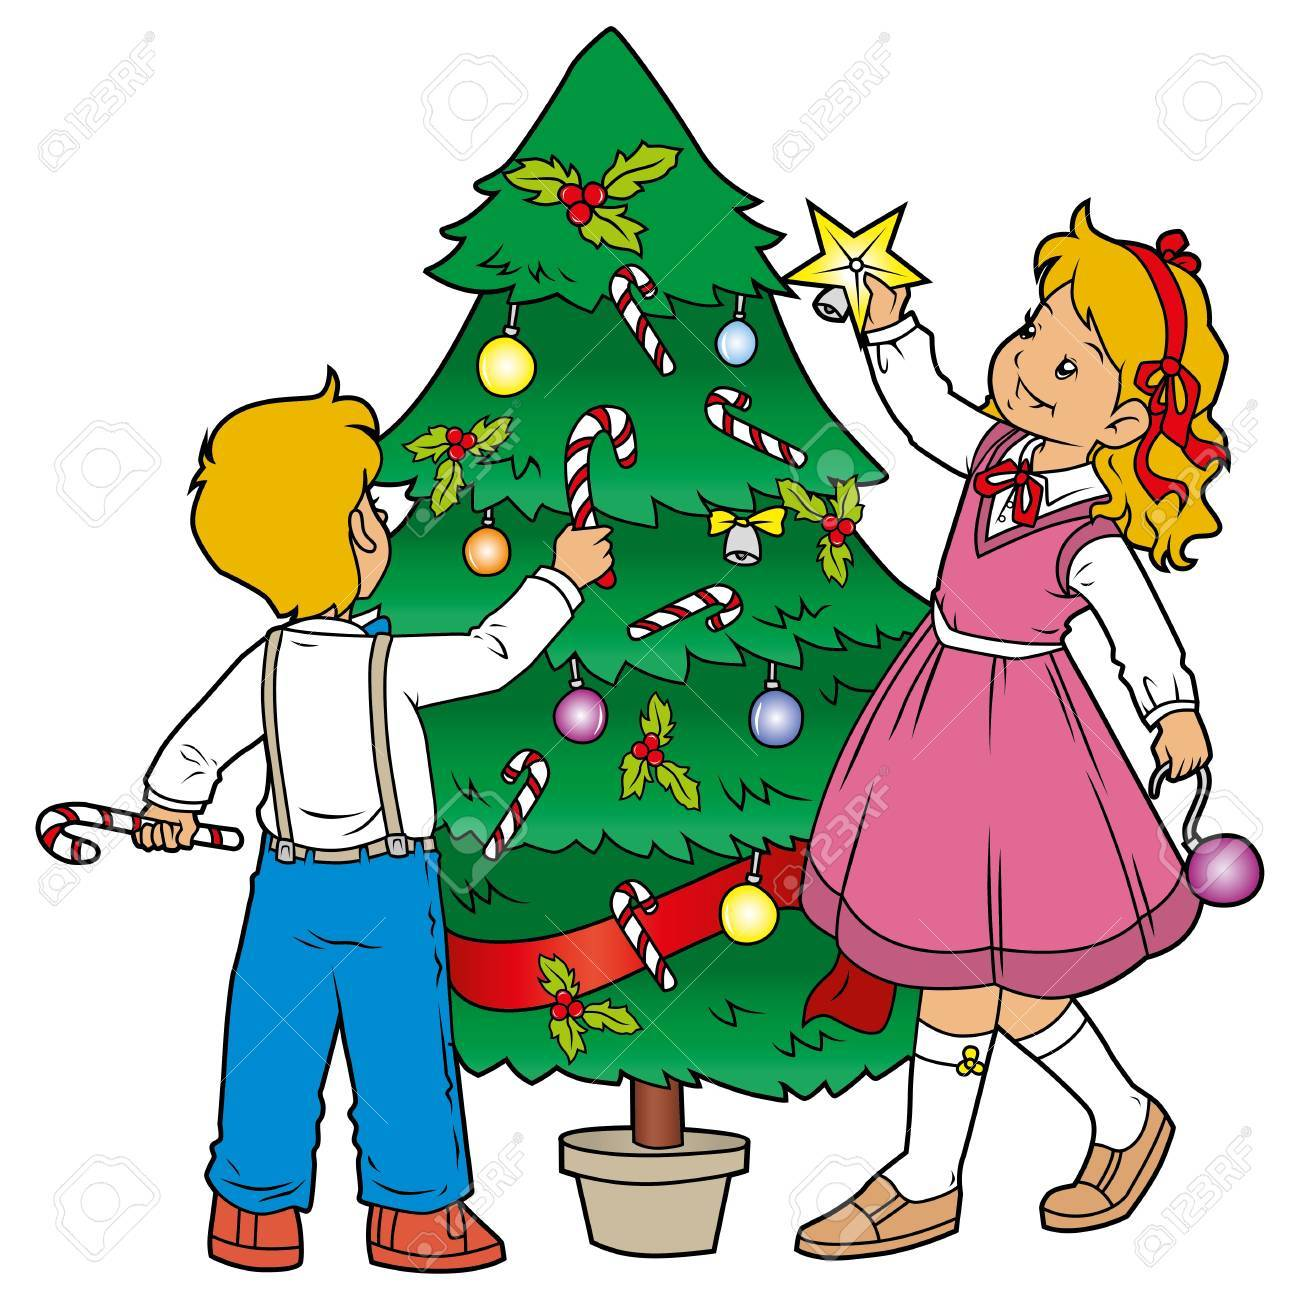 Decorating christmas tree Stock Vector - 15825883